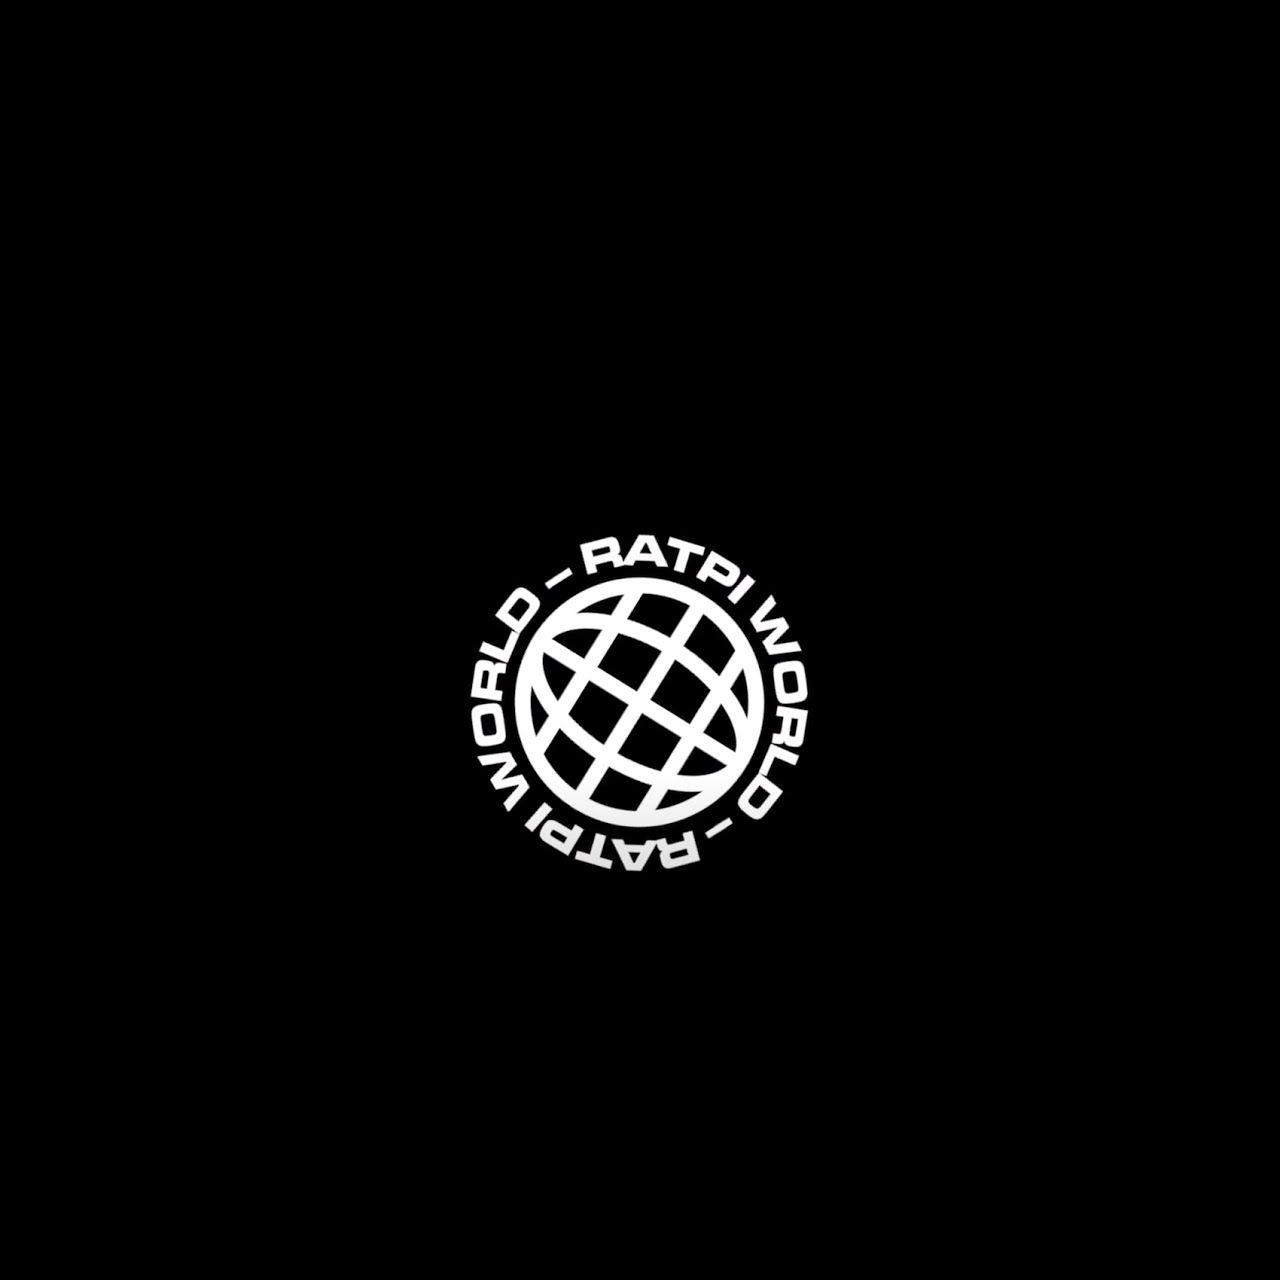 Booba - Ratpi world (Thumbnail)